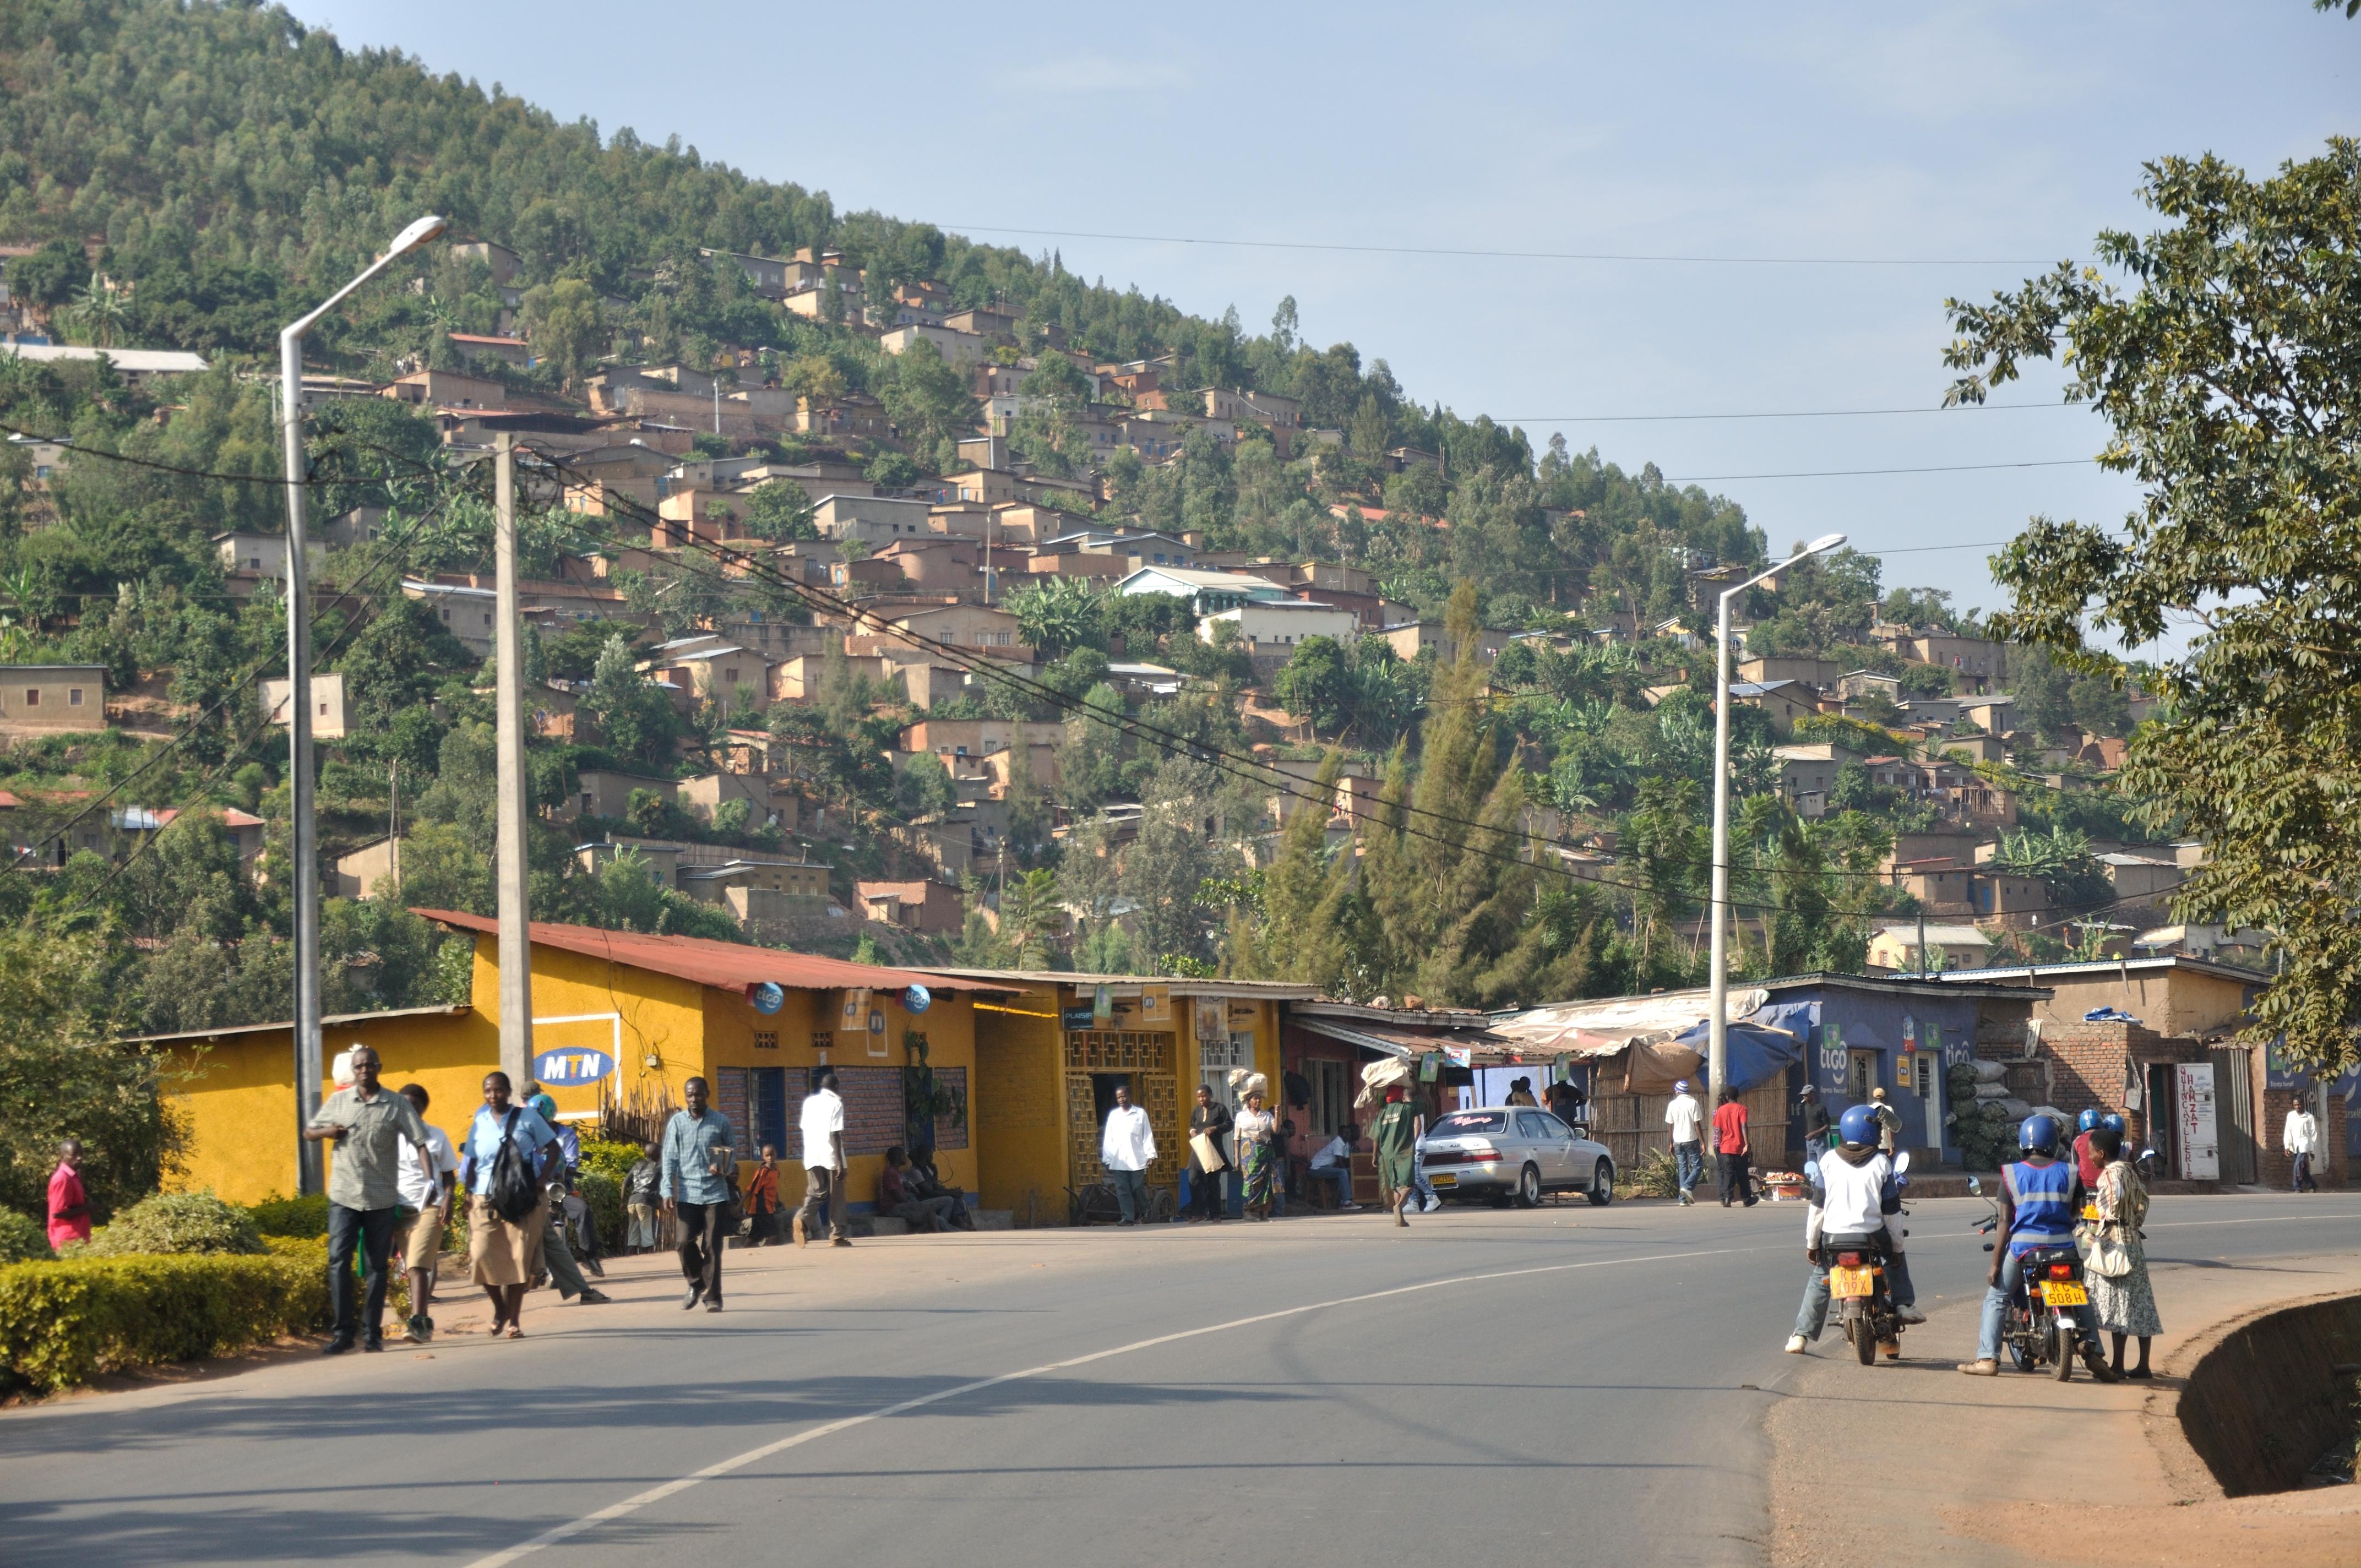 Kigali Rwanda  City pictures : 2013 06 05 13 29 16 Rwanda Kigali Kiruhura Wikimedia ...